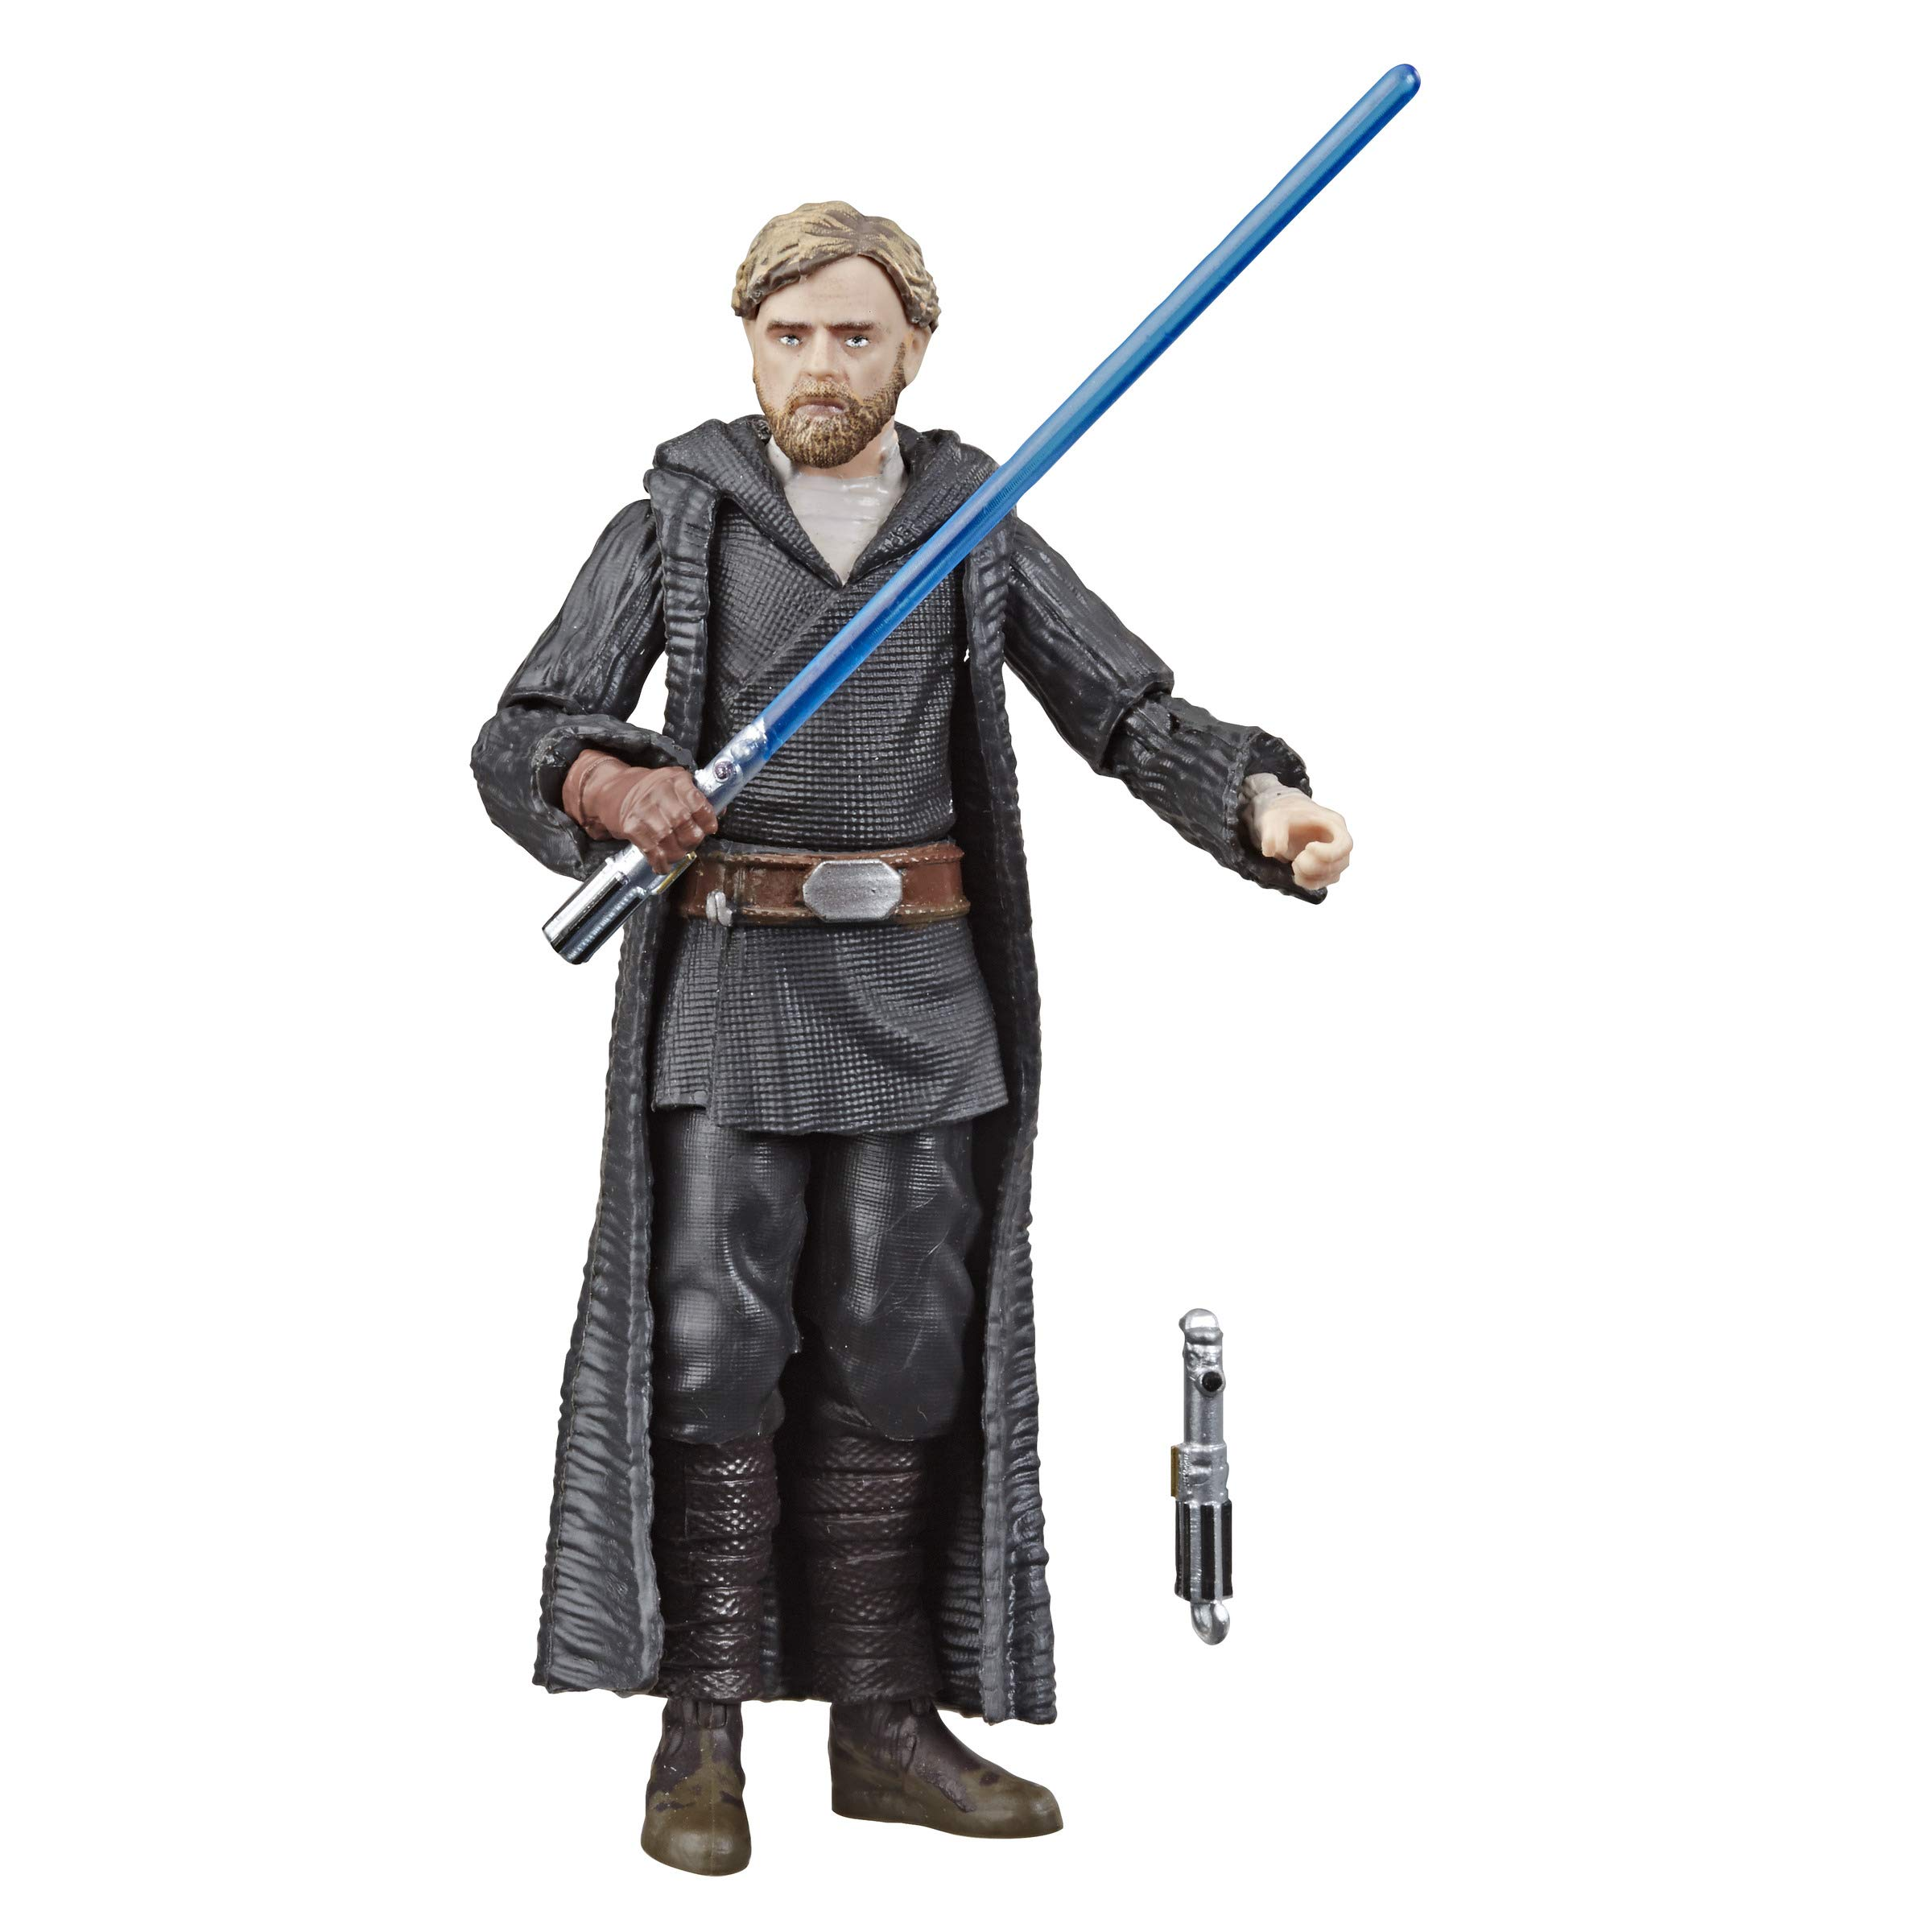 Star Wars The Vintage Collection Episode Viii The Last Jedi Luke Skywalker Crait 3 75 Scale Action Figure Buy Online In Albania At Desertcart